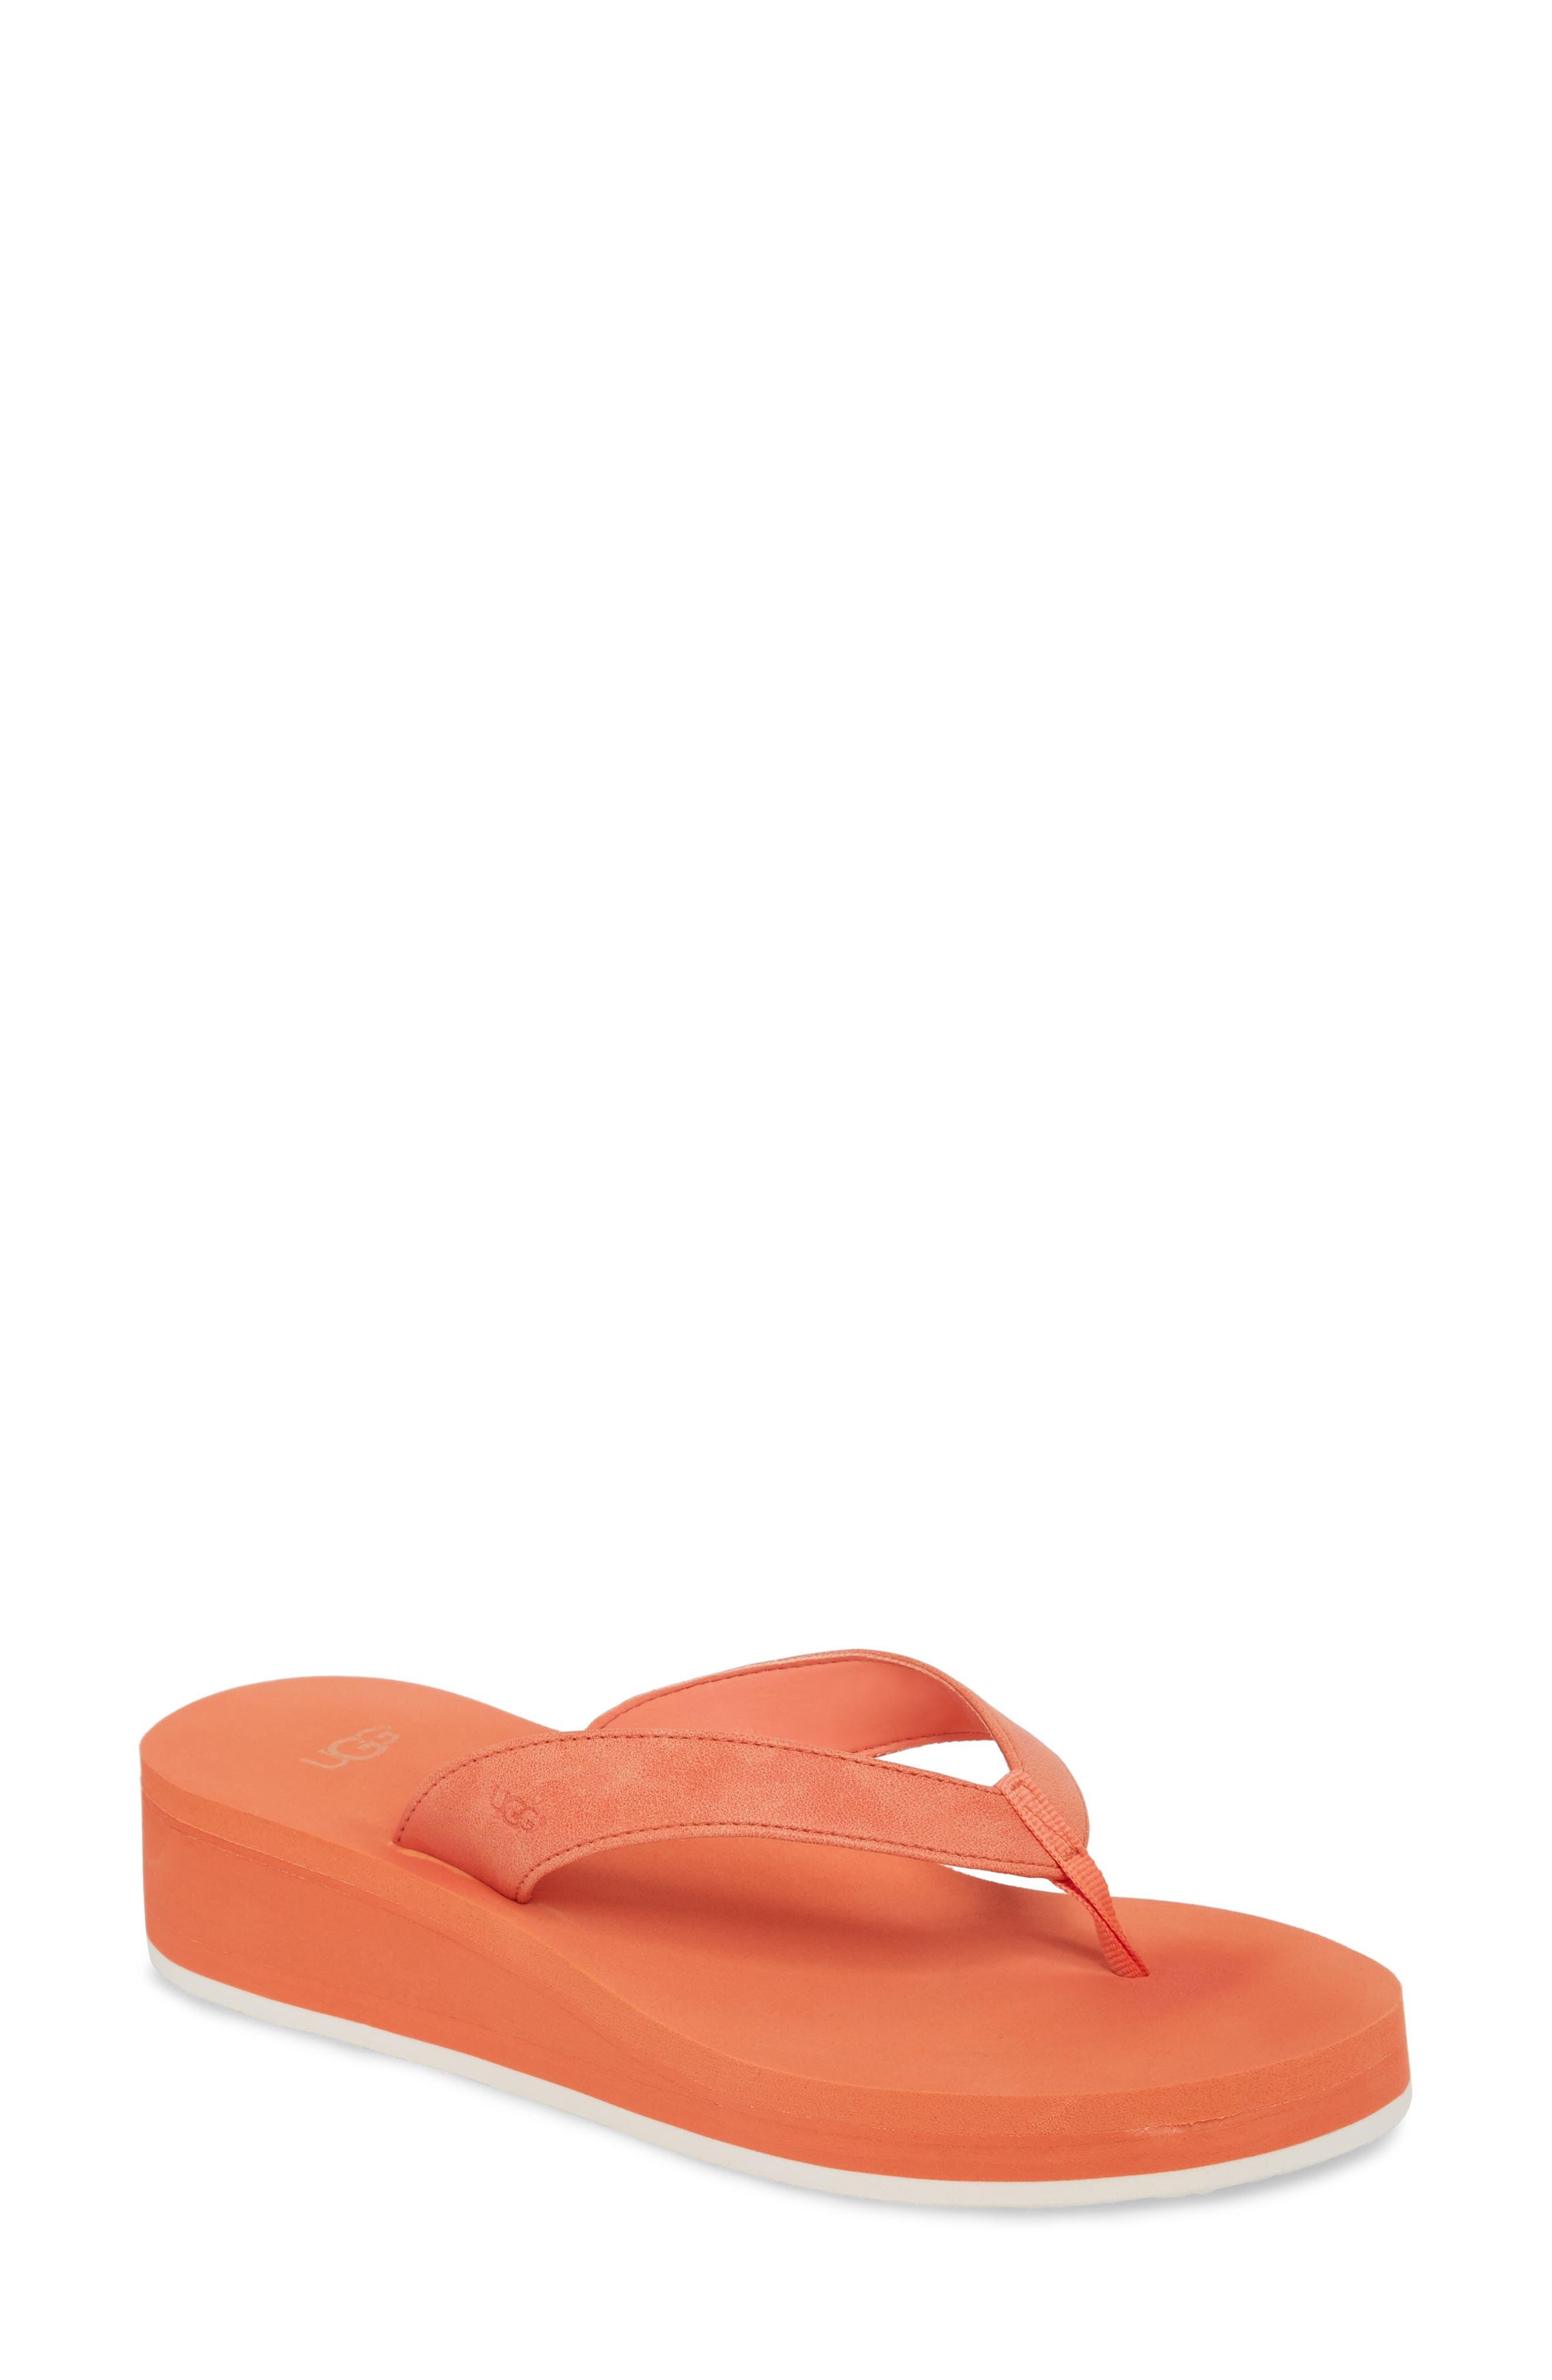 Dani Wedge Flip Flop,                         Main,                         color, Fusion Coral